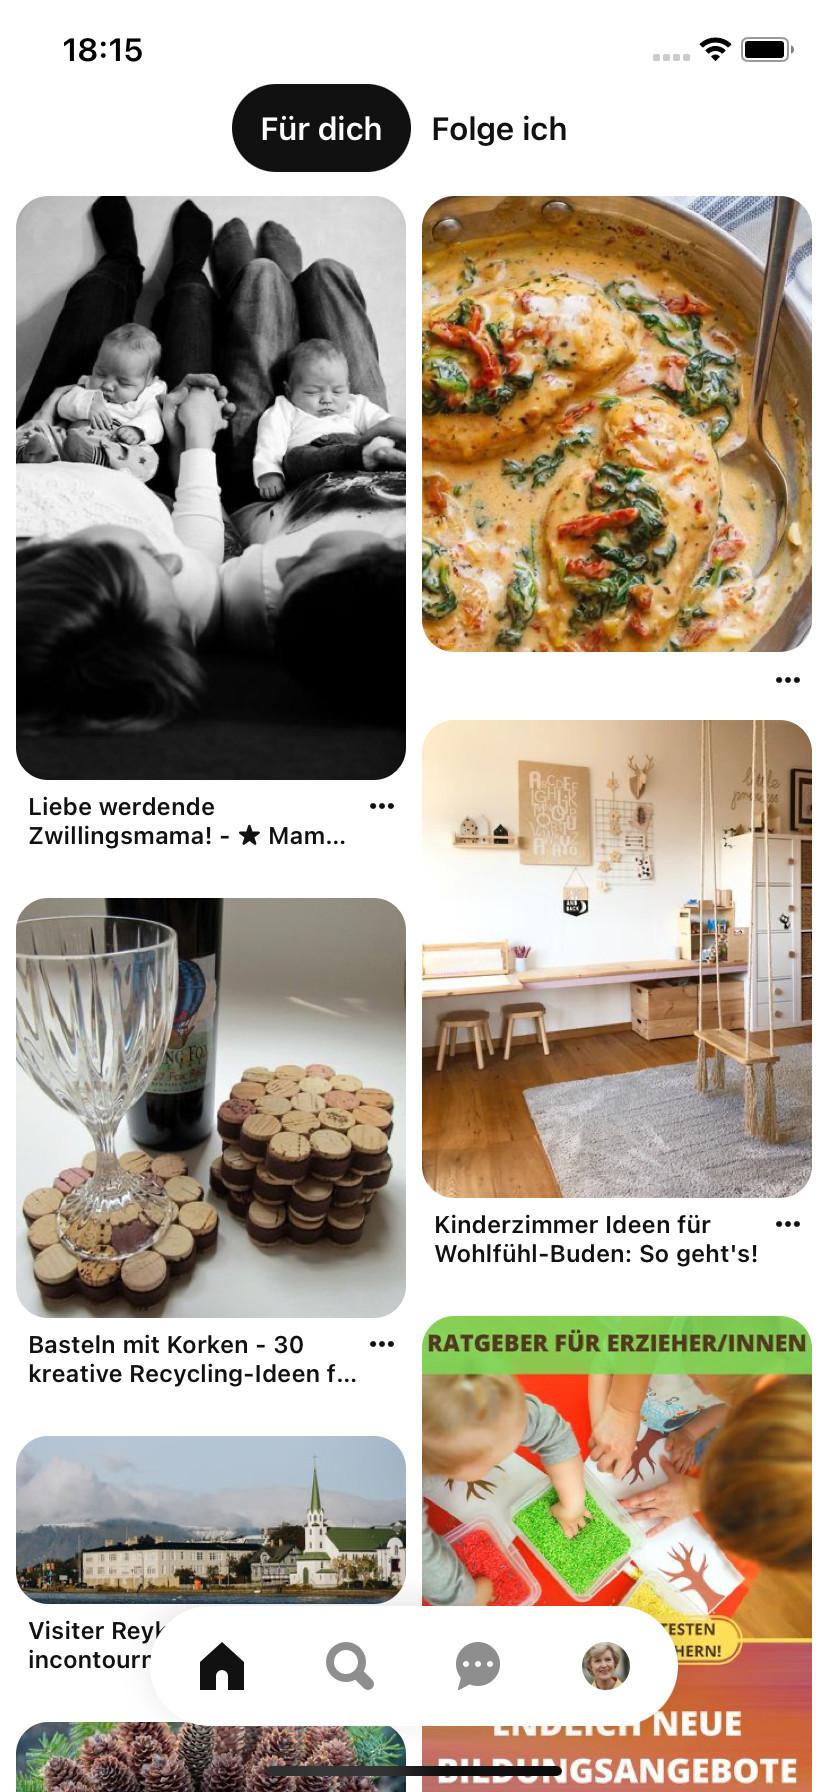 Screenshot 1 - Pinterest (App für iPhone & iPad)